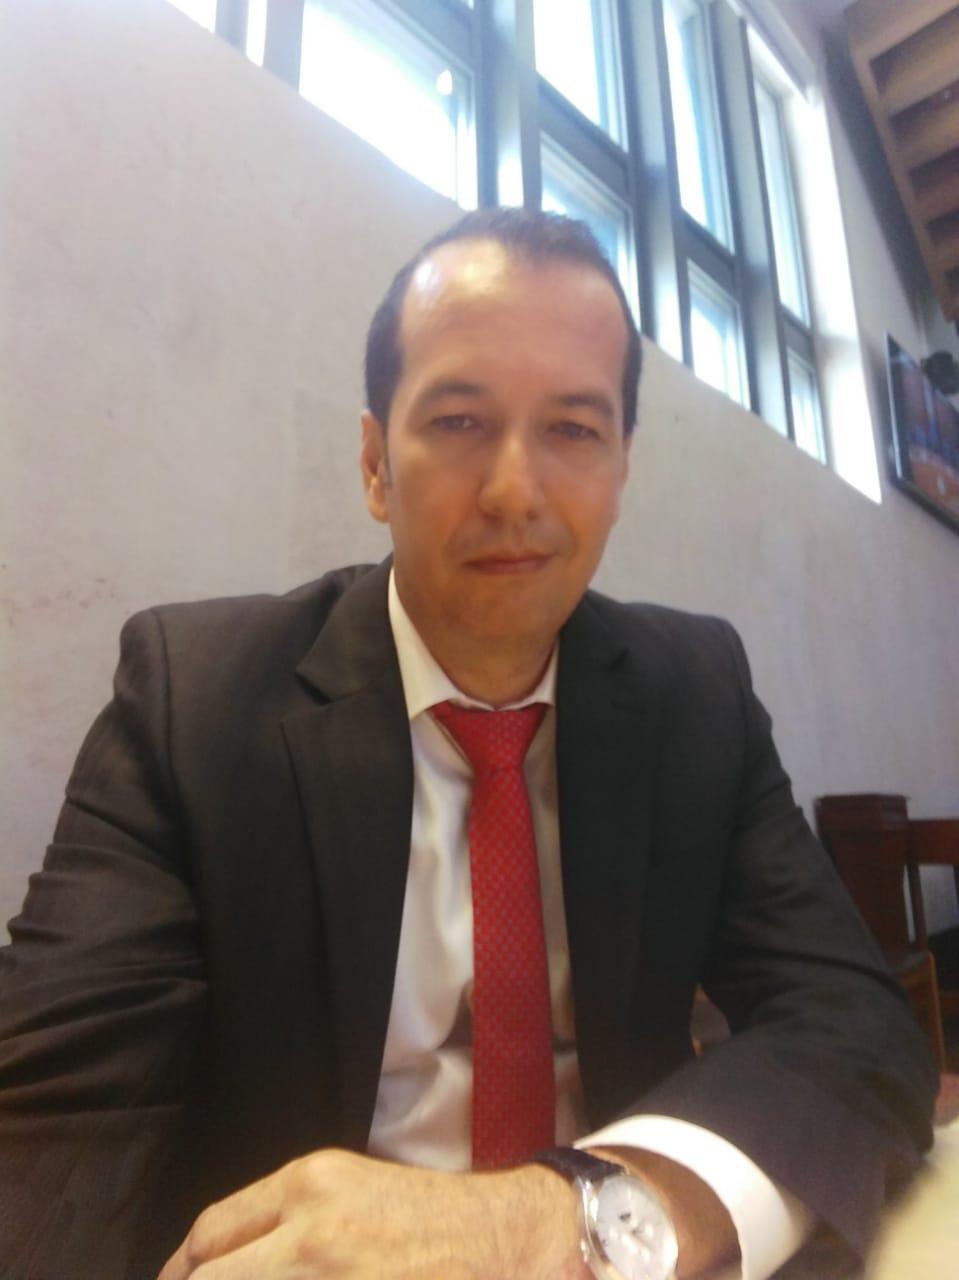 Tribunal de arbitramento de Cartagena falló a favor del departamento de Casanare